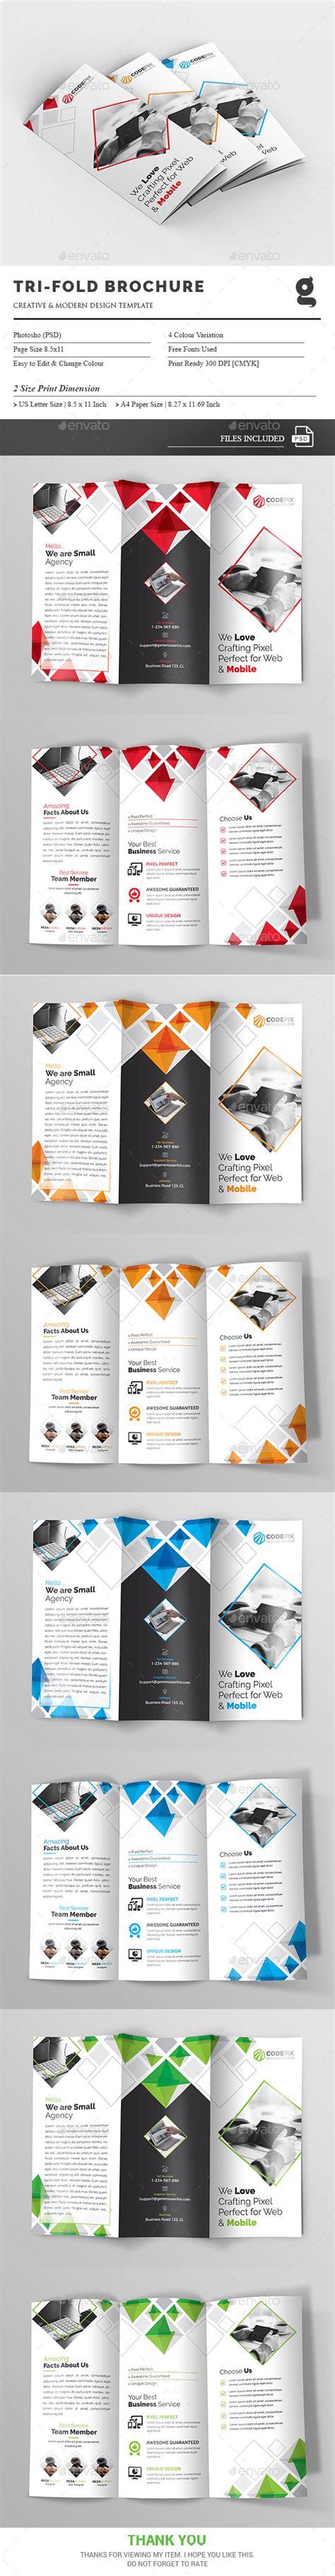 trifold template album ideas tri fold brochure template psd brochure templates